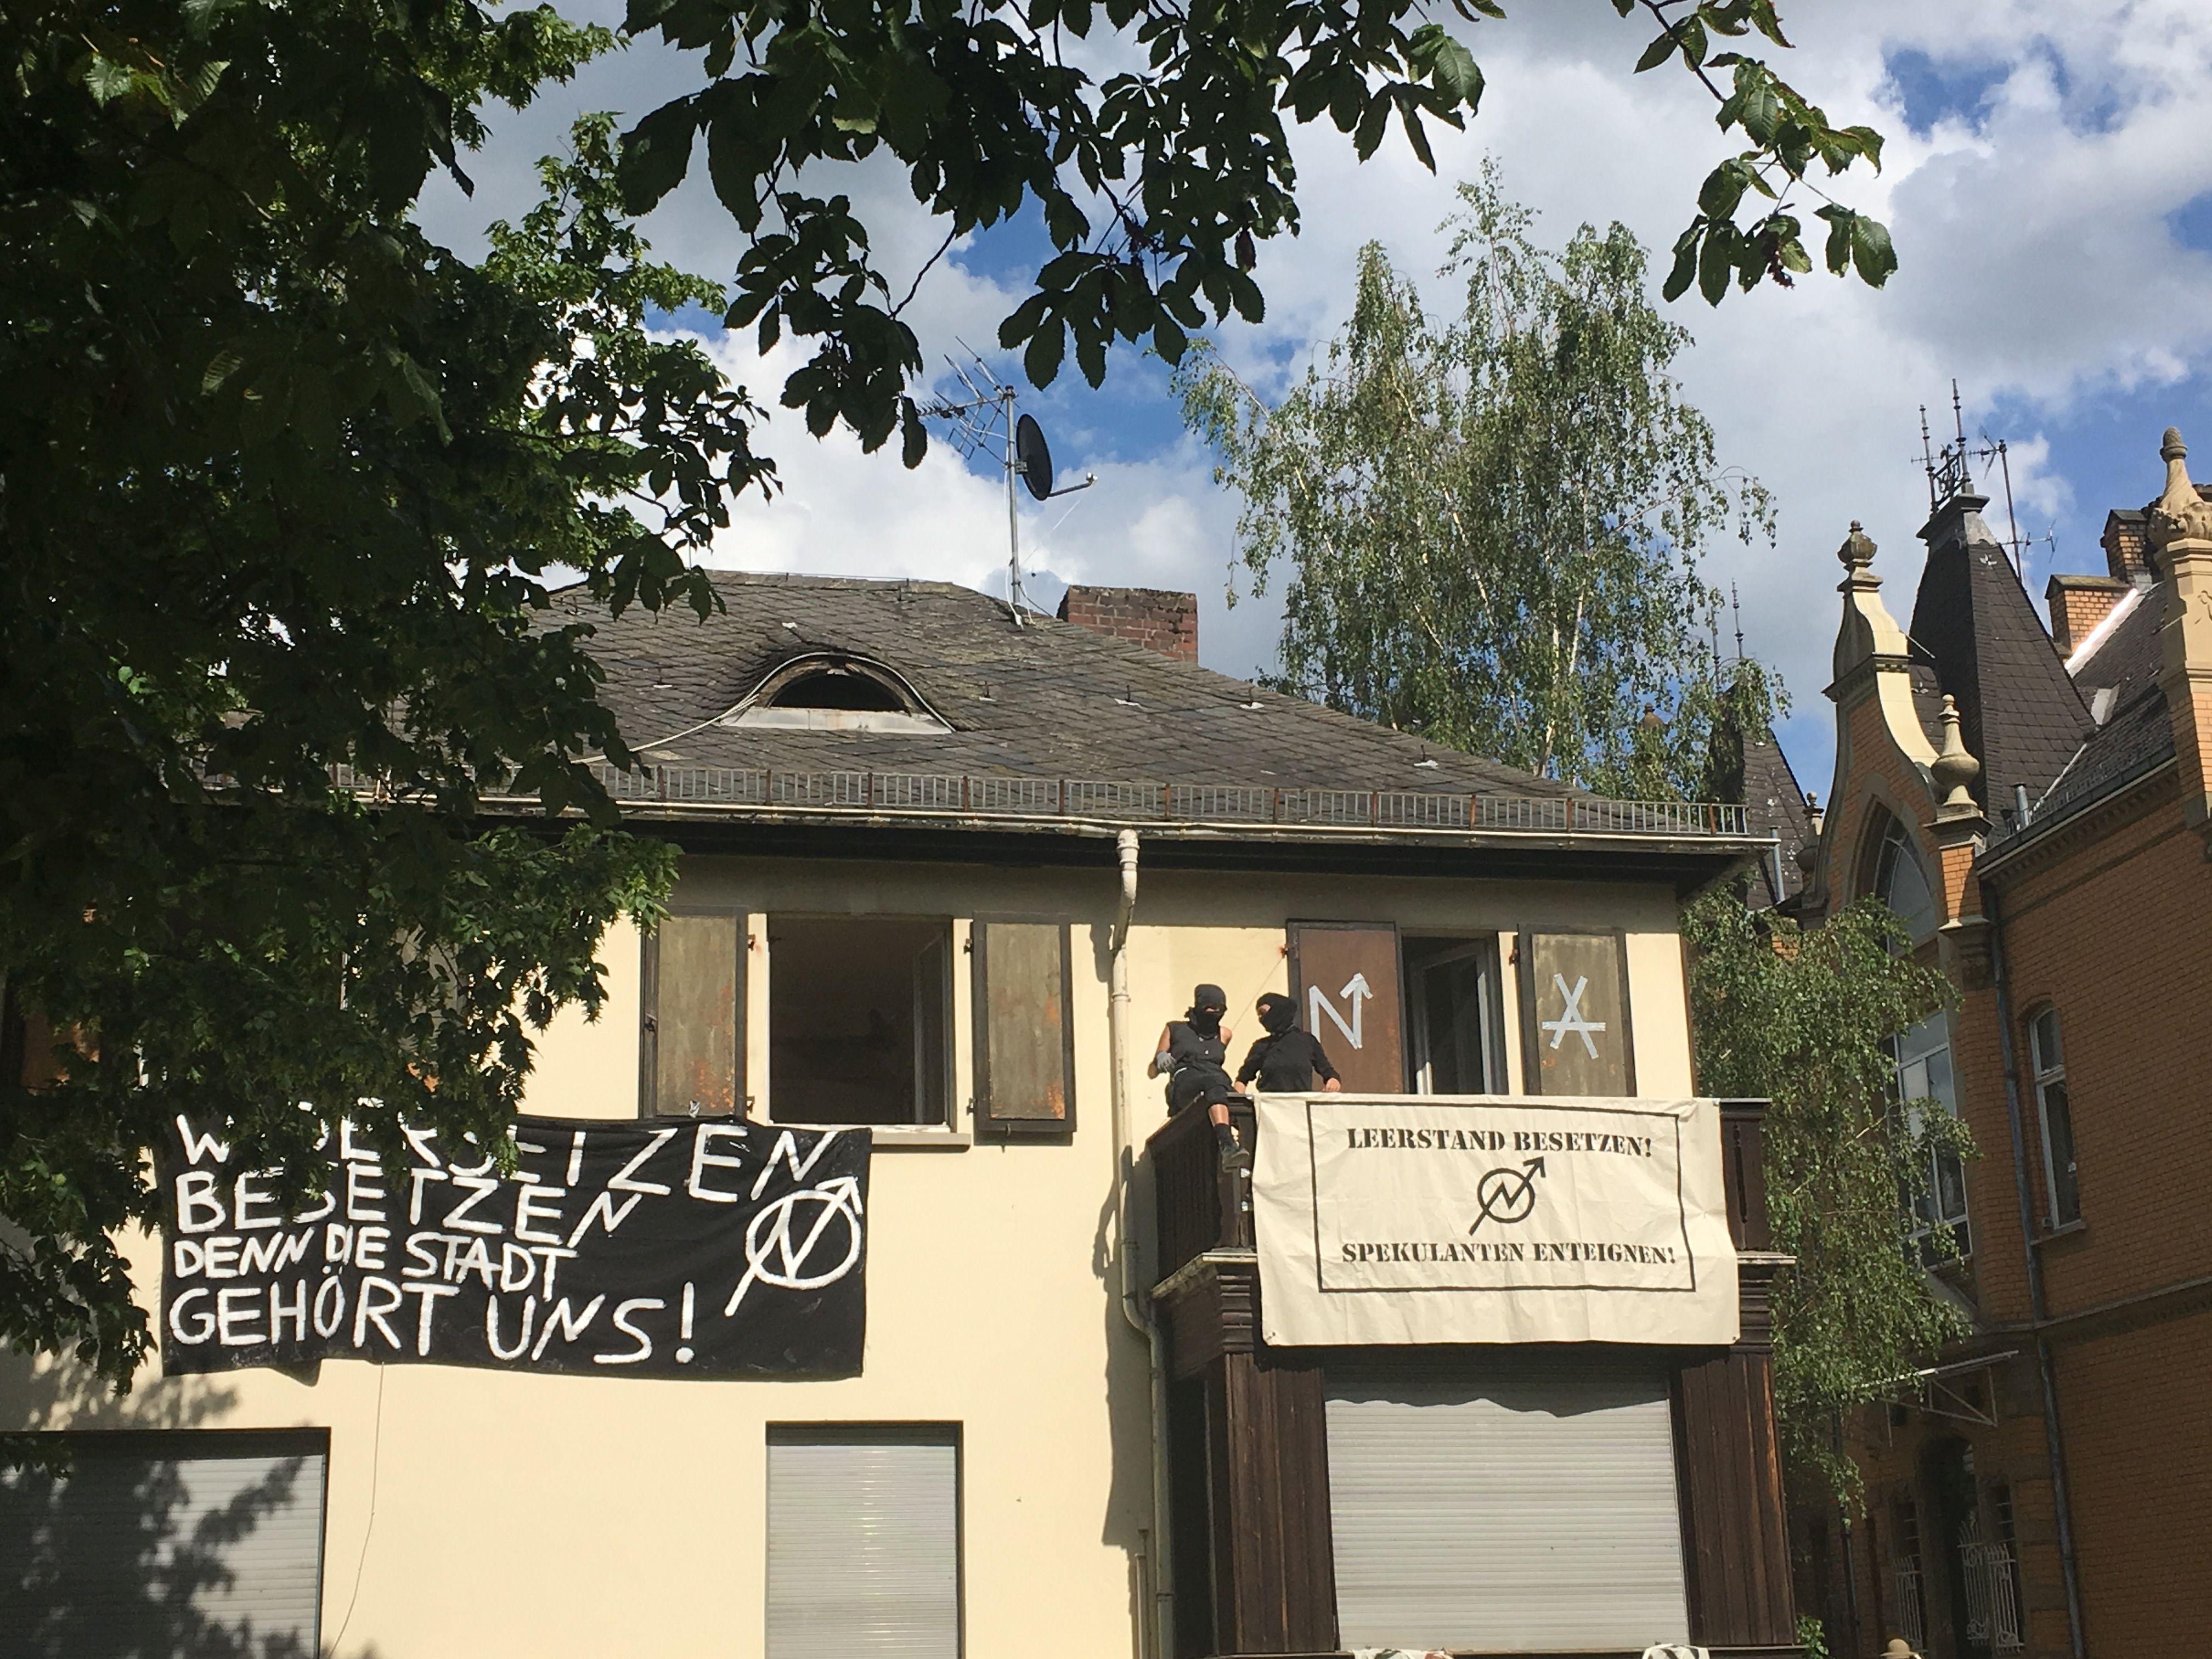 Hausbesetzung Am Landeshaus Aufruf Zur Solidaritäts Mahnwache